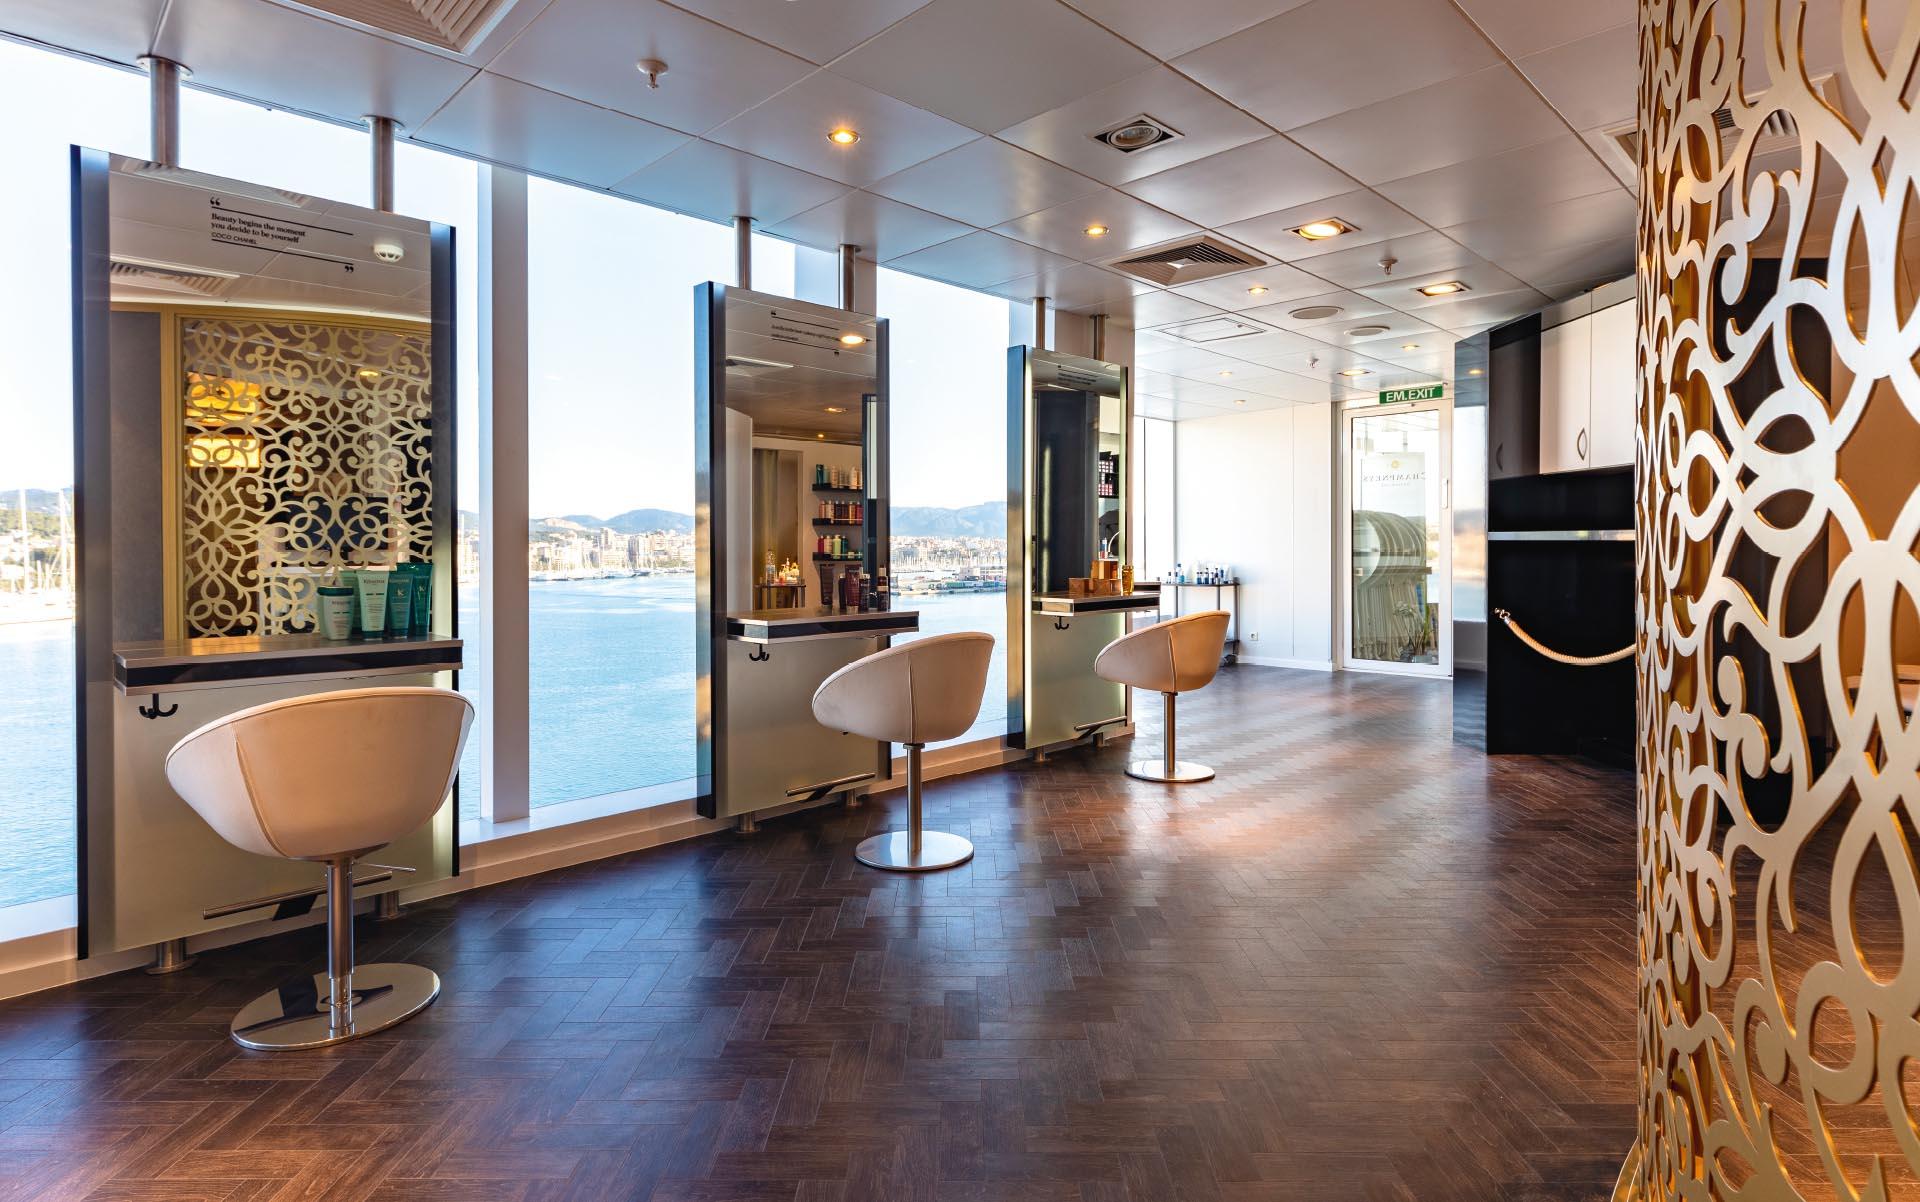 Champneys-cruiseship-Butterscotch-Tui-Spa-designers